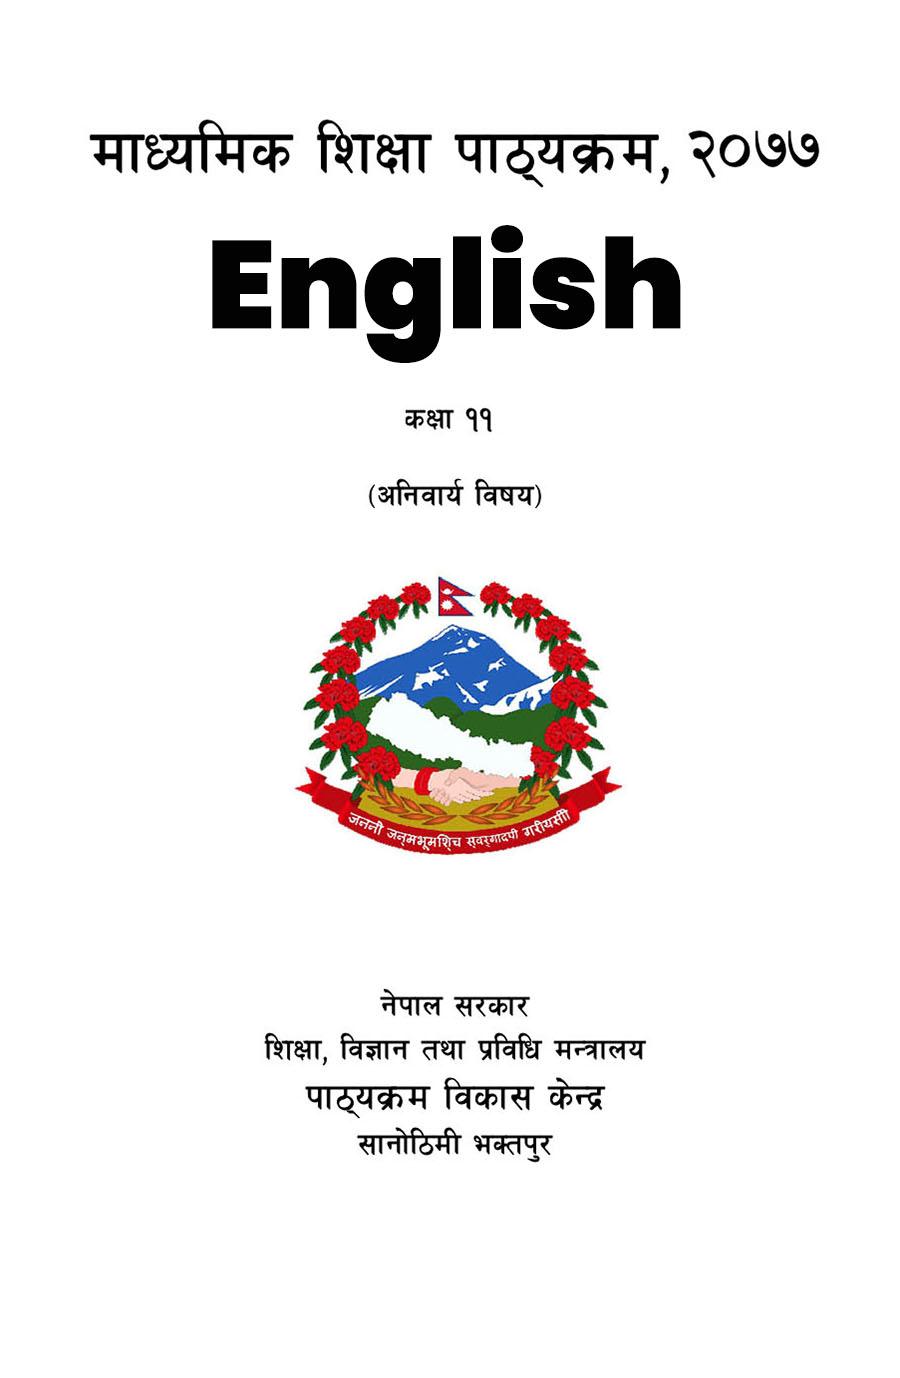 Grade-11-XI-Compulsory-English-Curriculum-Subject-Code-003-2077-DOWNLOAD-in-PDF